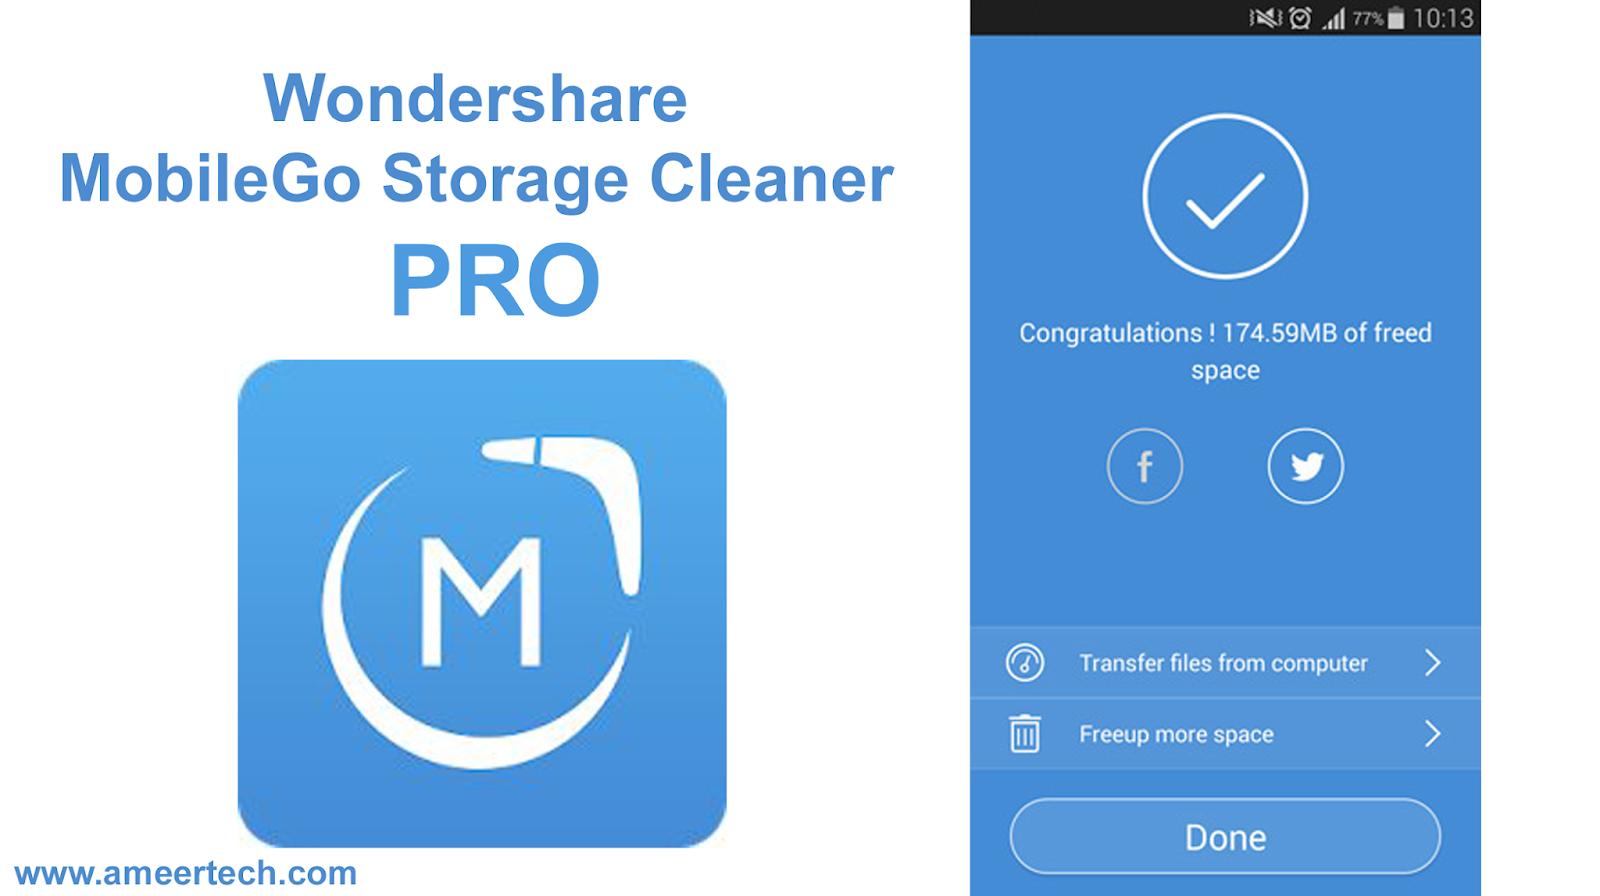 Wondershare MobileGo Storage Cleaner PRO APK Download (2019)